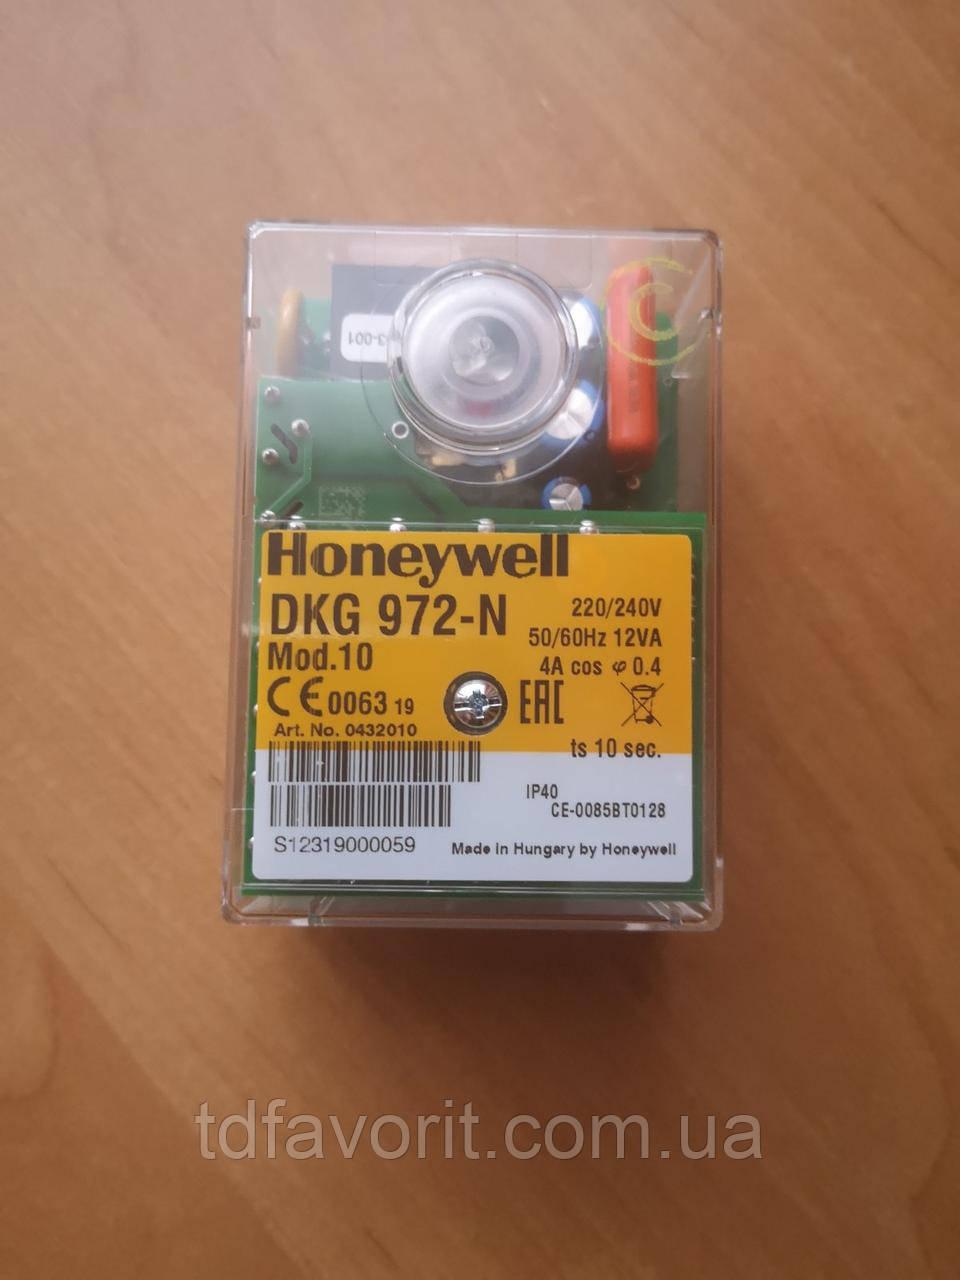 Satronic (Honeywell) DKG 972 N mod.10